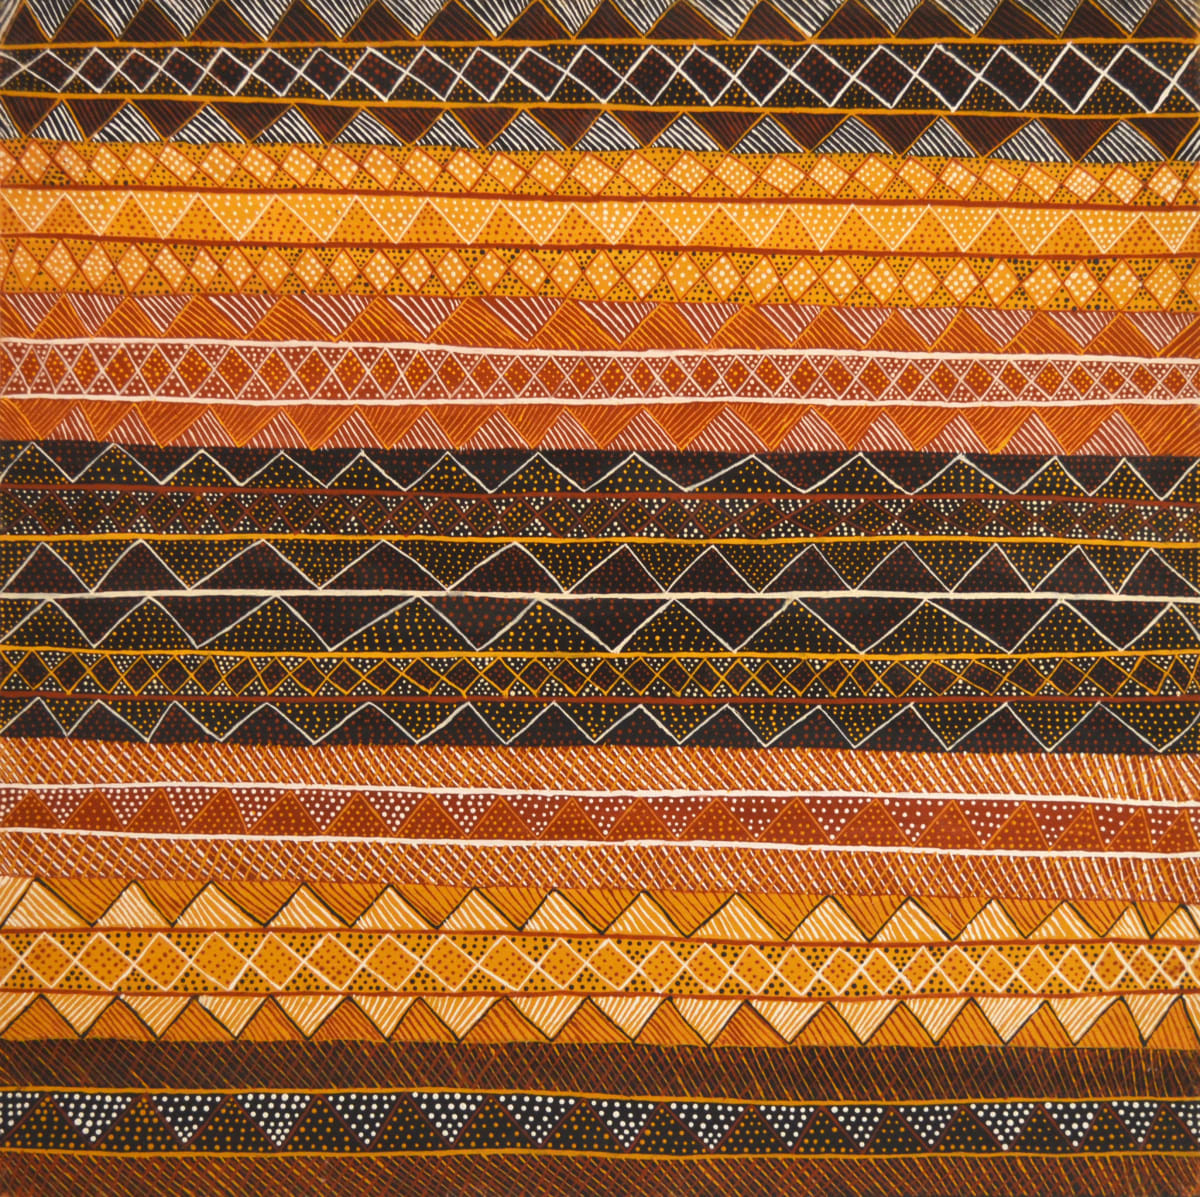 Jacinta Lorenzo Kayimwagakimi Jilamara natural ochres on linen 120 x 120 cm